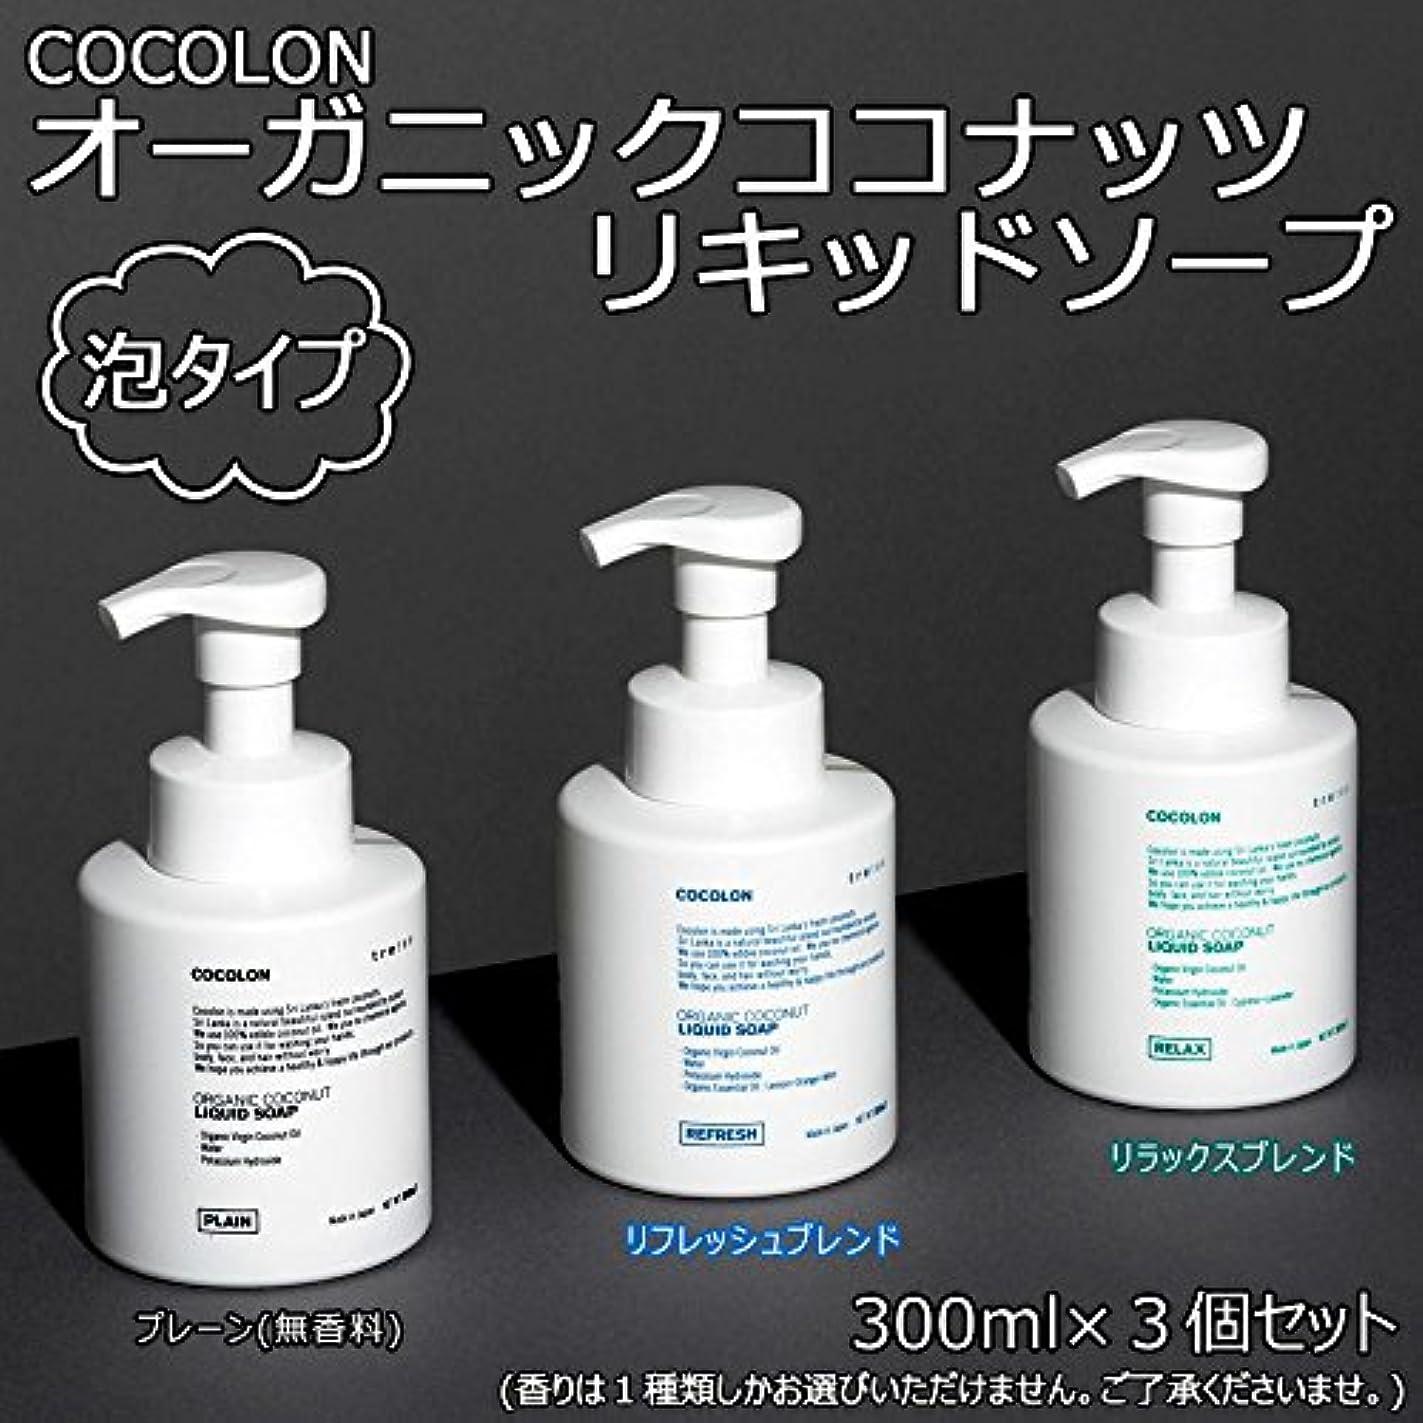 COCOLON ココロン オーガニックココナッツリキッドソープ 泡タイプ 300ml 3個セット リフレッシュブレンド